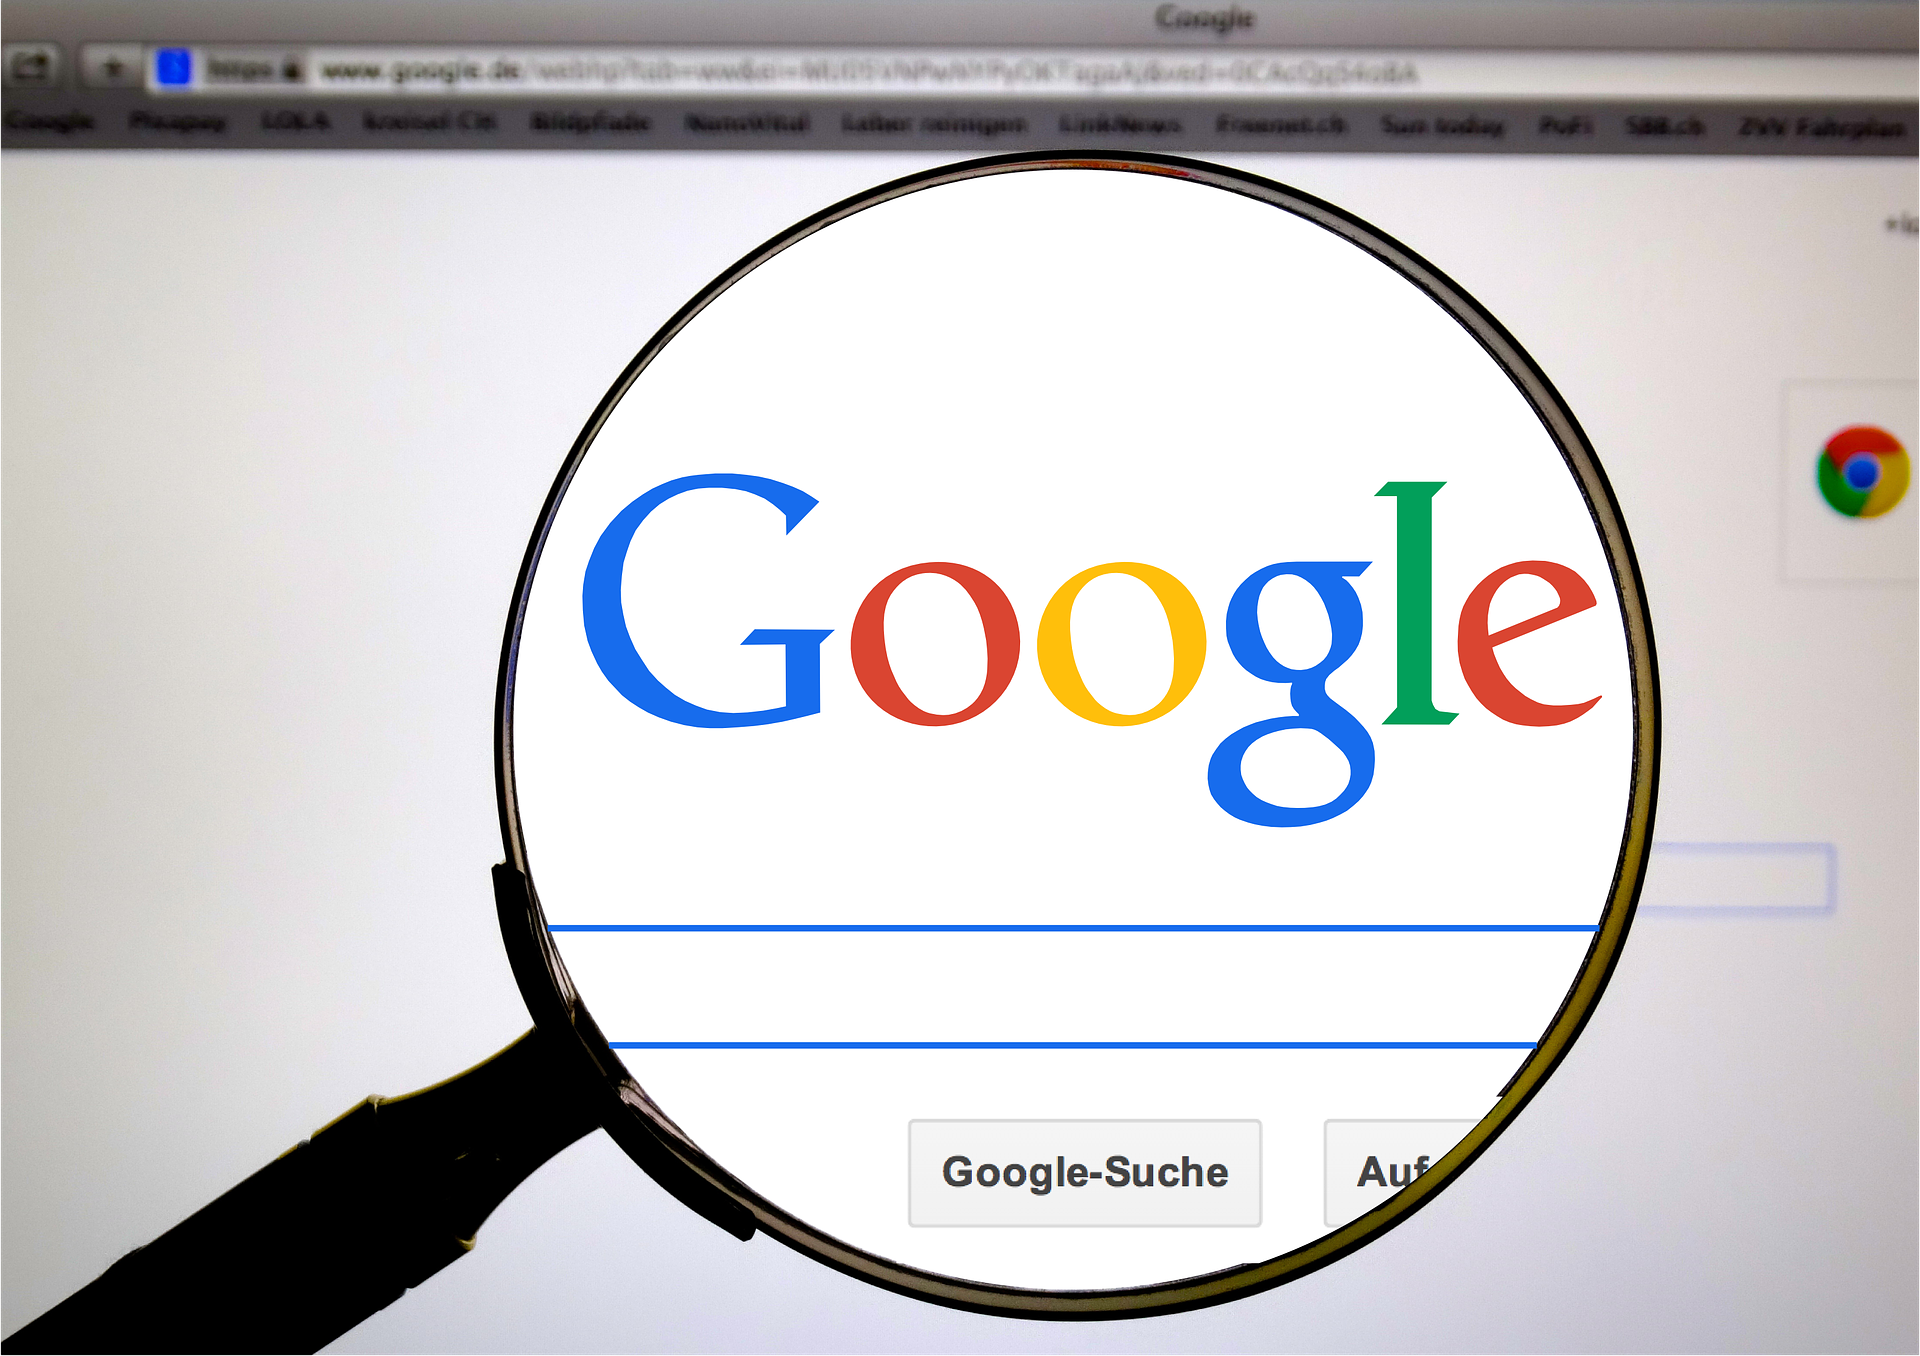 Mobilegeddon: Google Strikes Back [INFOGRAPHIC]